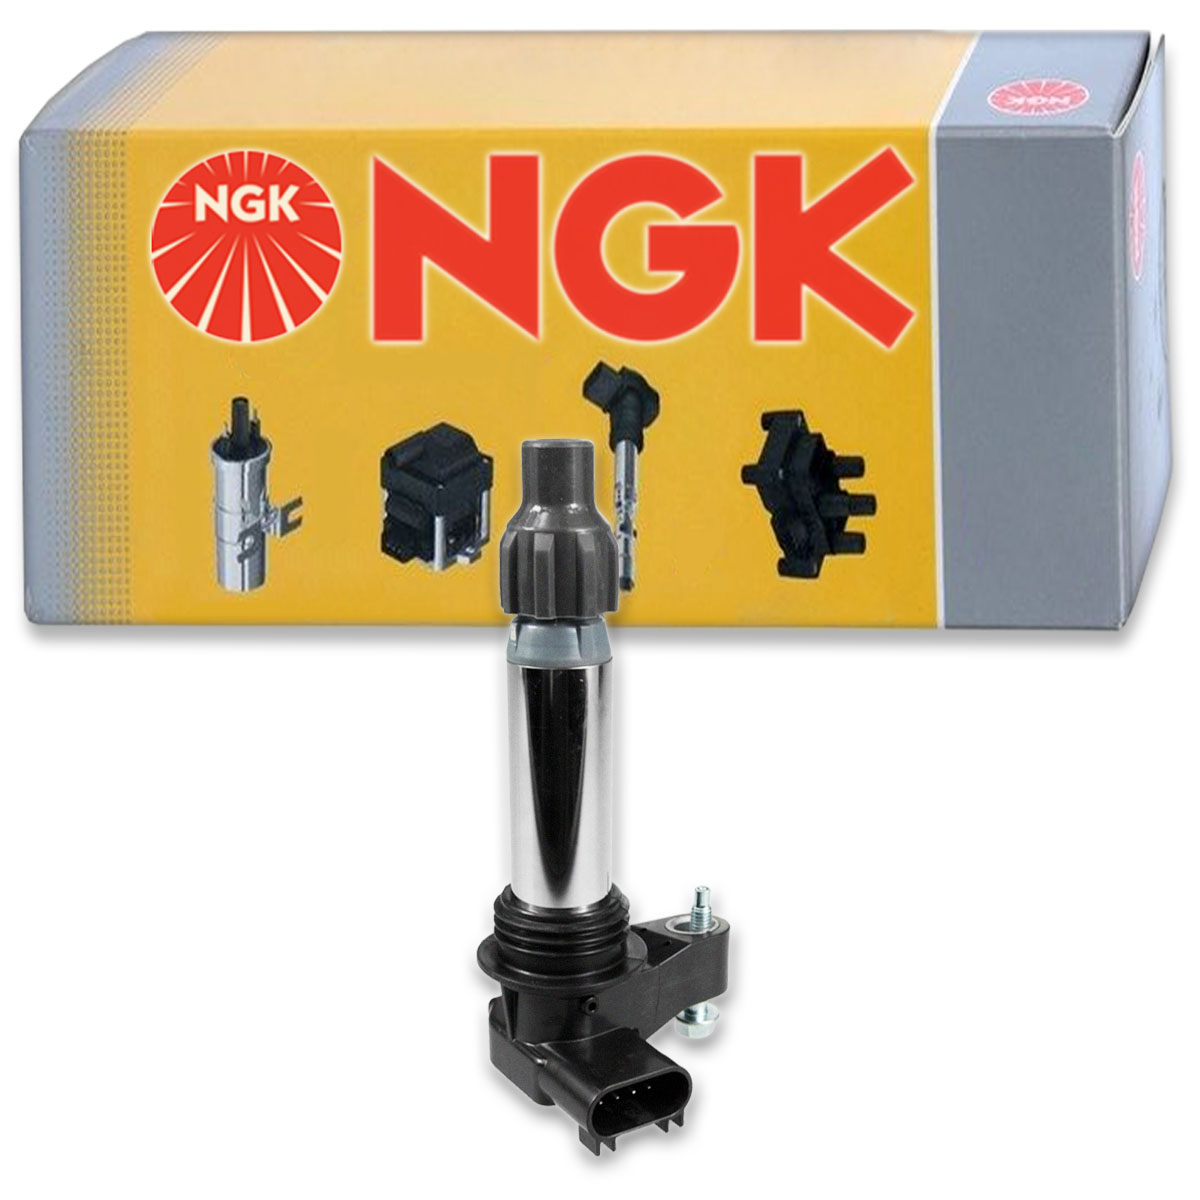 6 pcs NGK G-Power Plug Spark Plugs 2008-2010 Saturn Vue 3.5L V6 Kit Set Tune Up